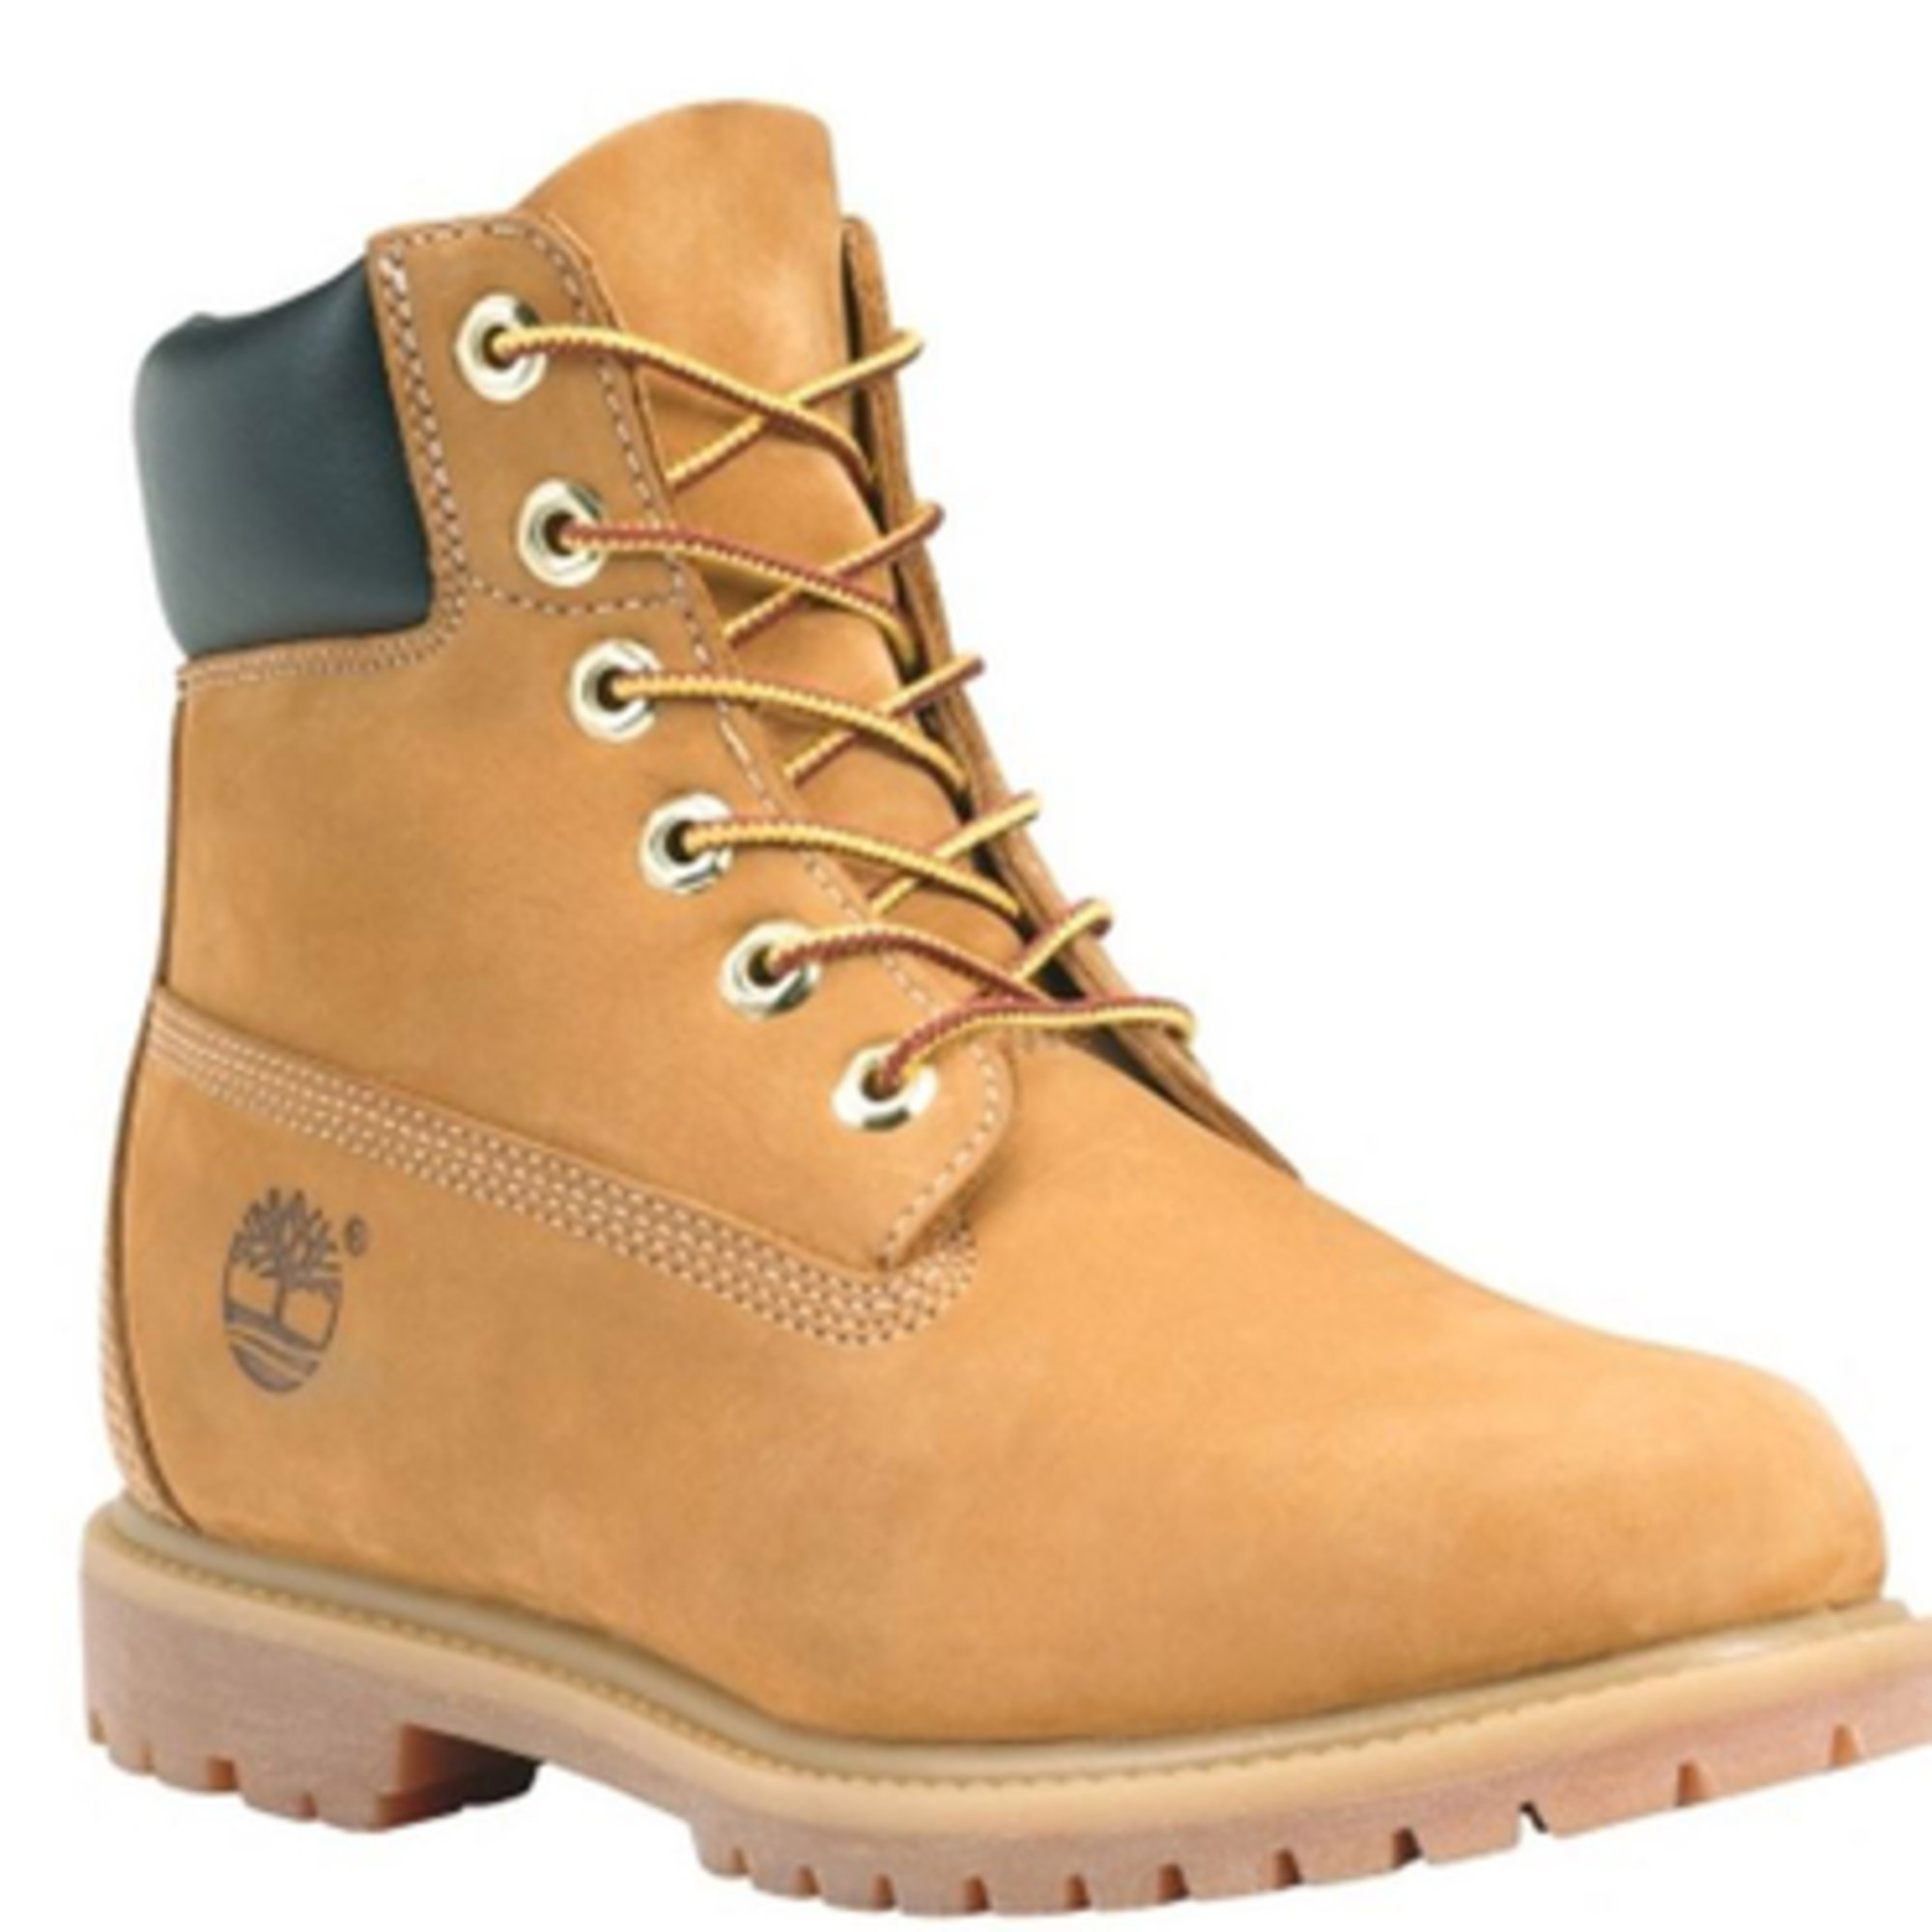 Timberland. Timberland Women s Earthkeepers Premium Boot a6d3529339